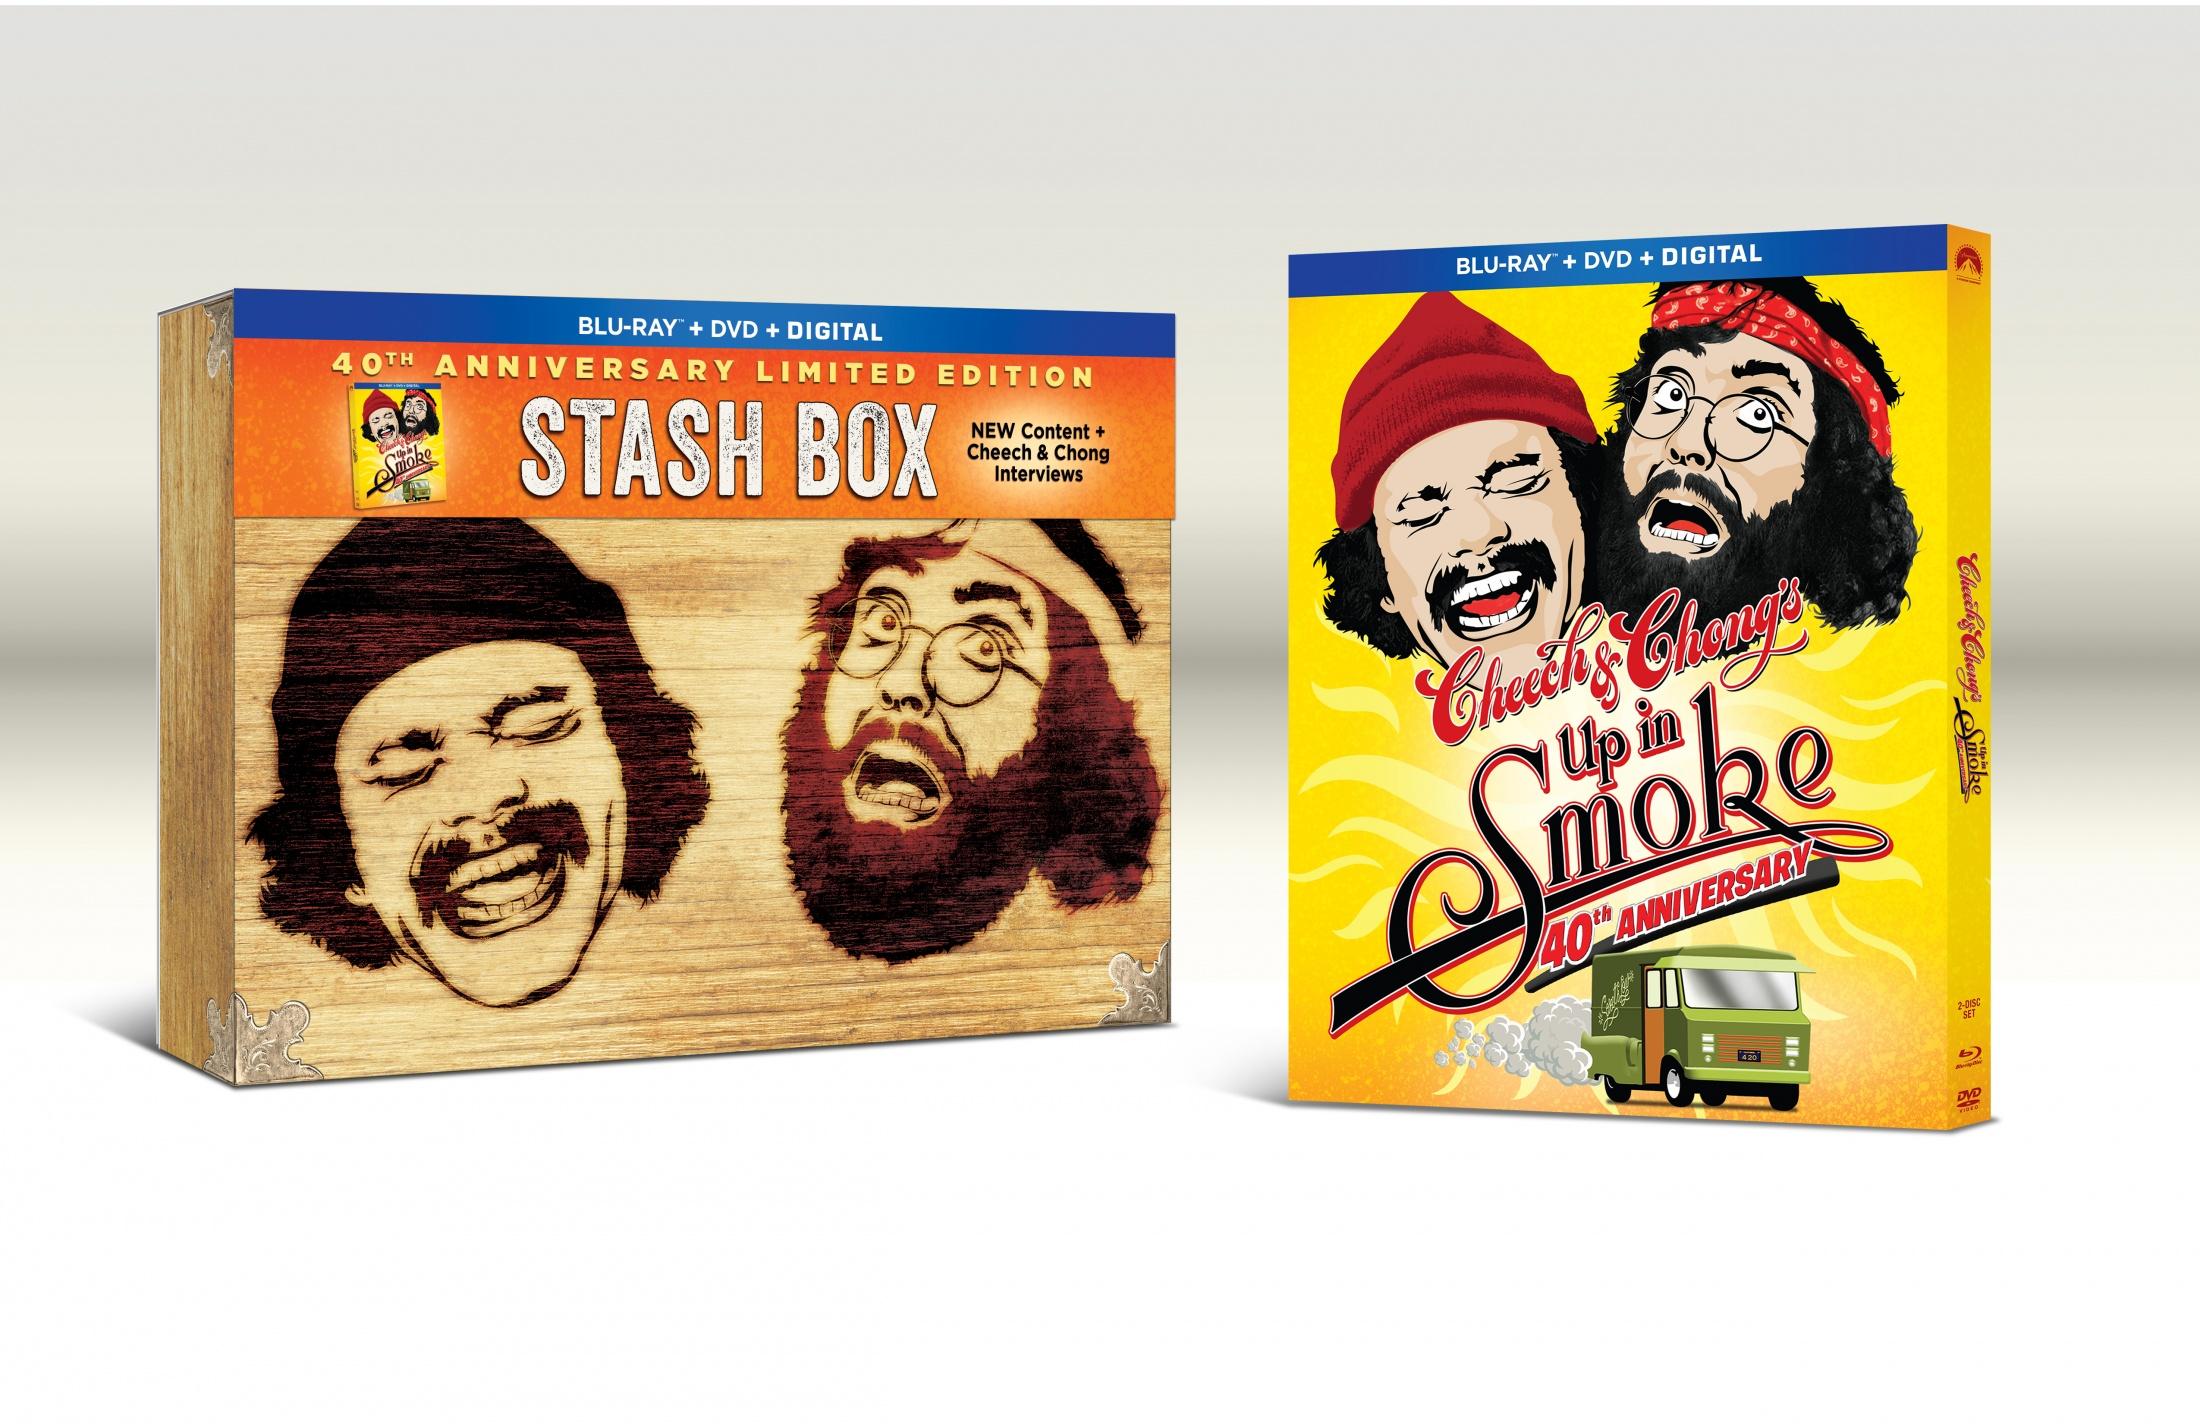 Thumbnail for Cheech and Chong Stash Box